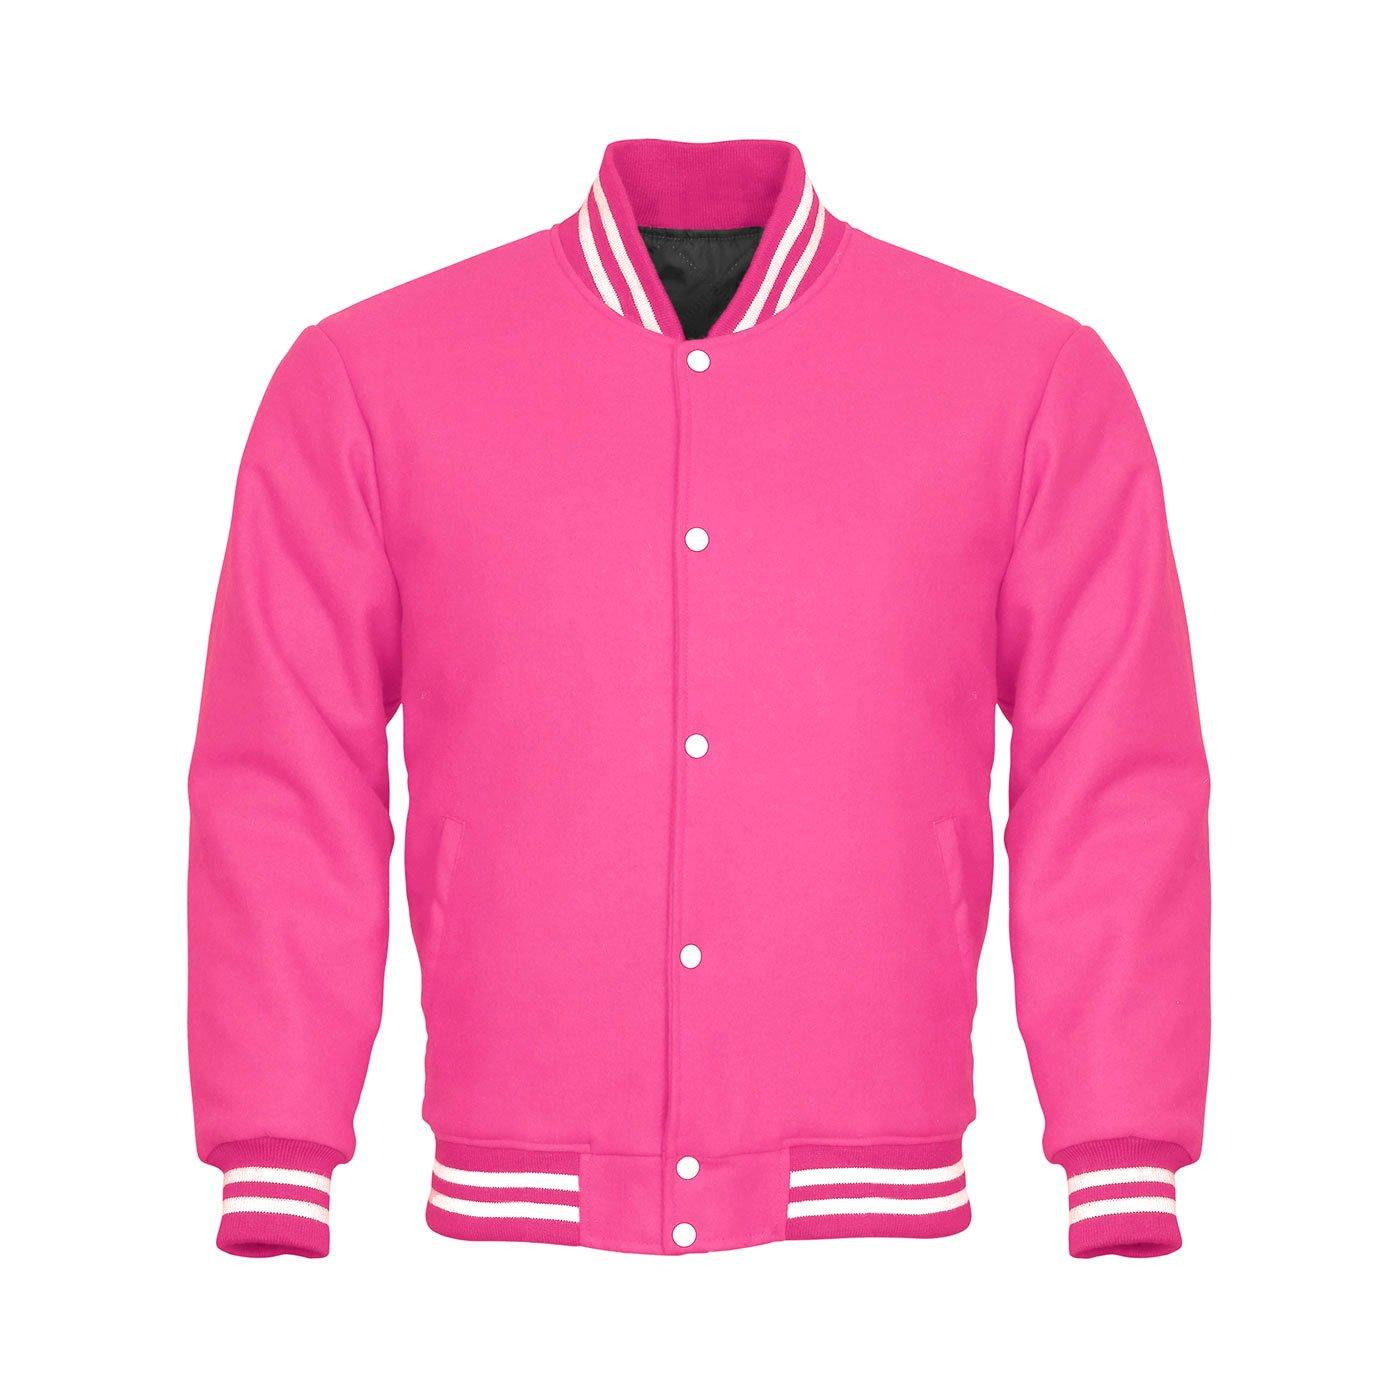 Letterman Varsity Jacket Full Wool Pink White (M) by Design Custom Jackets